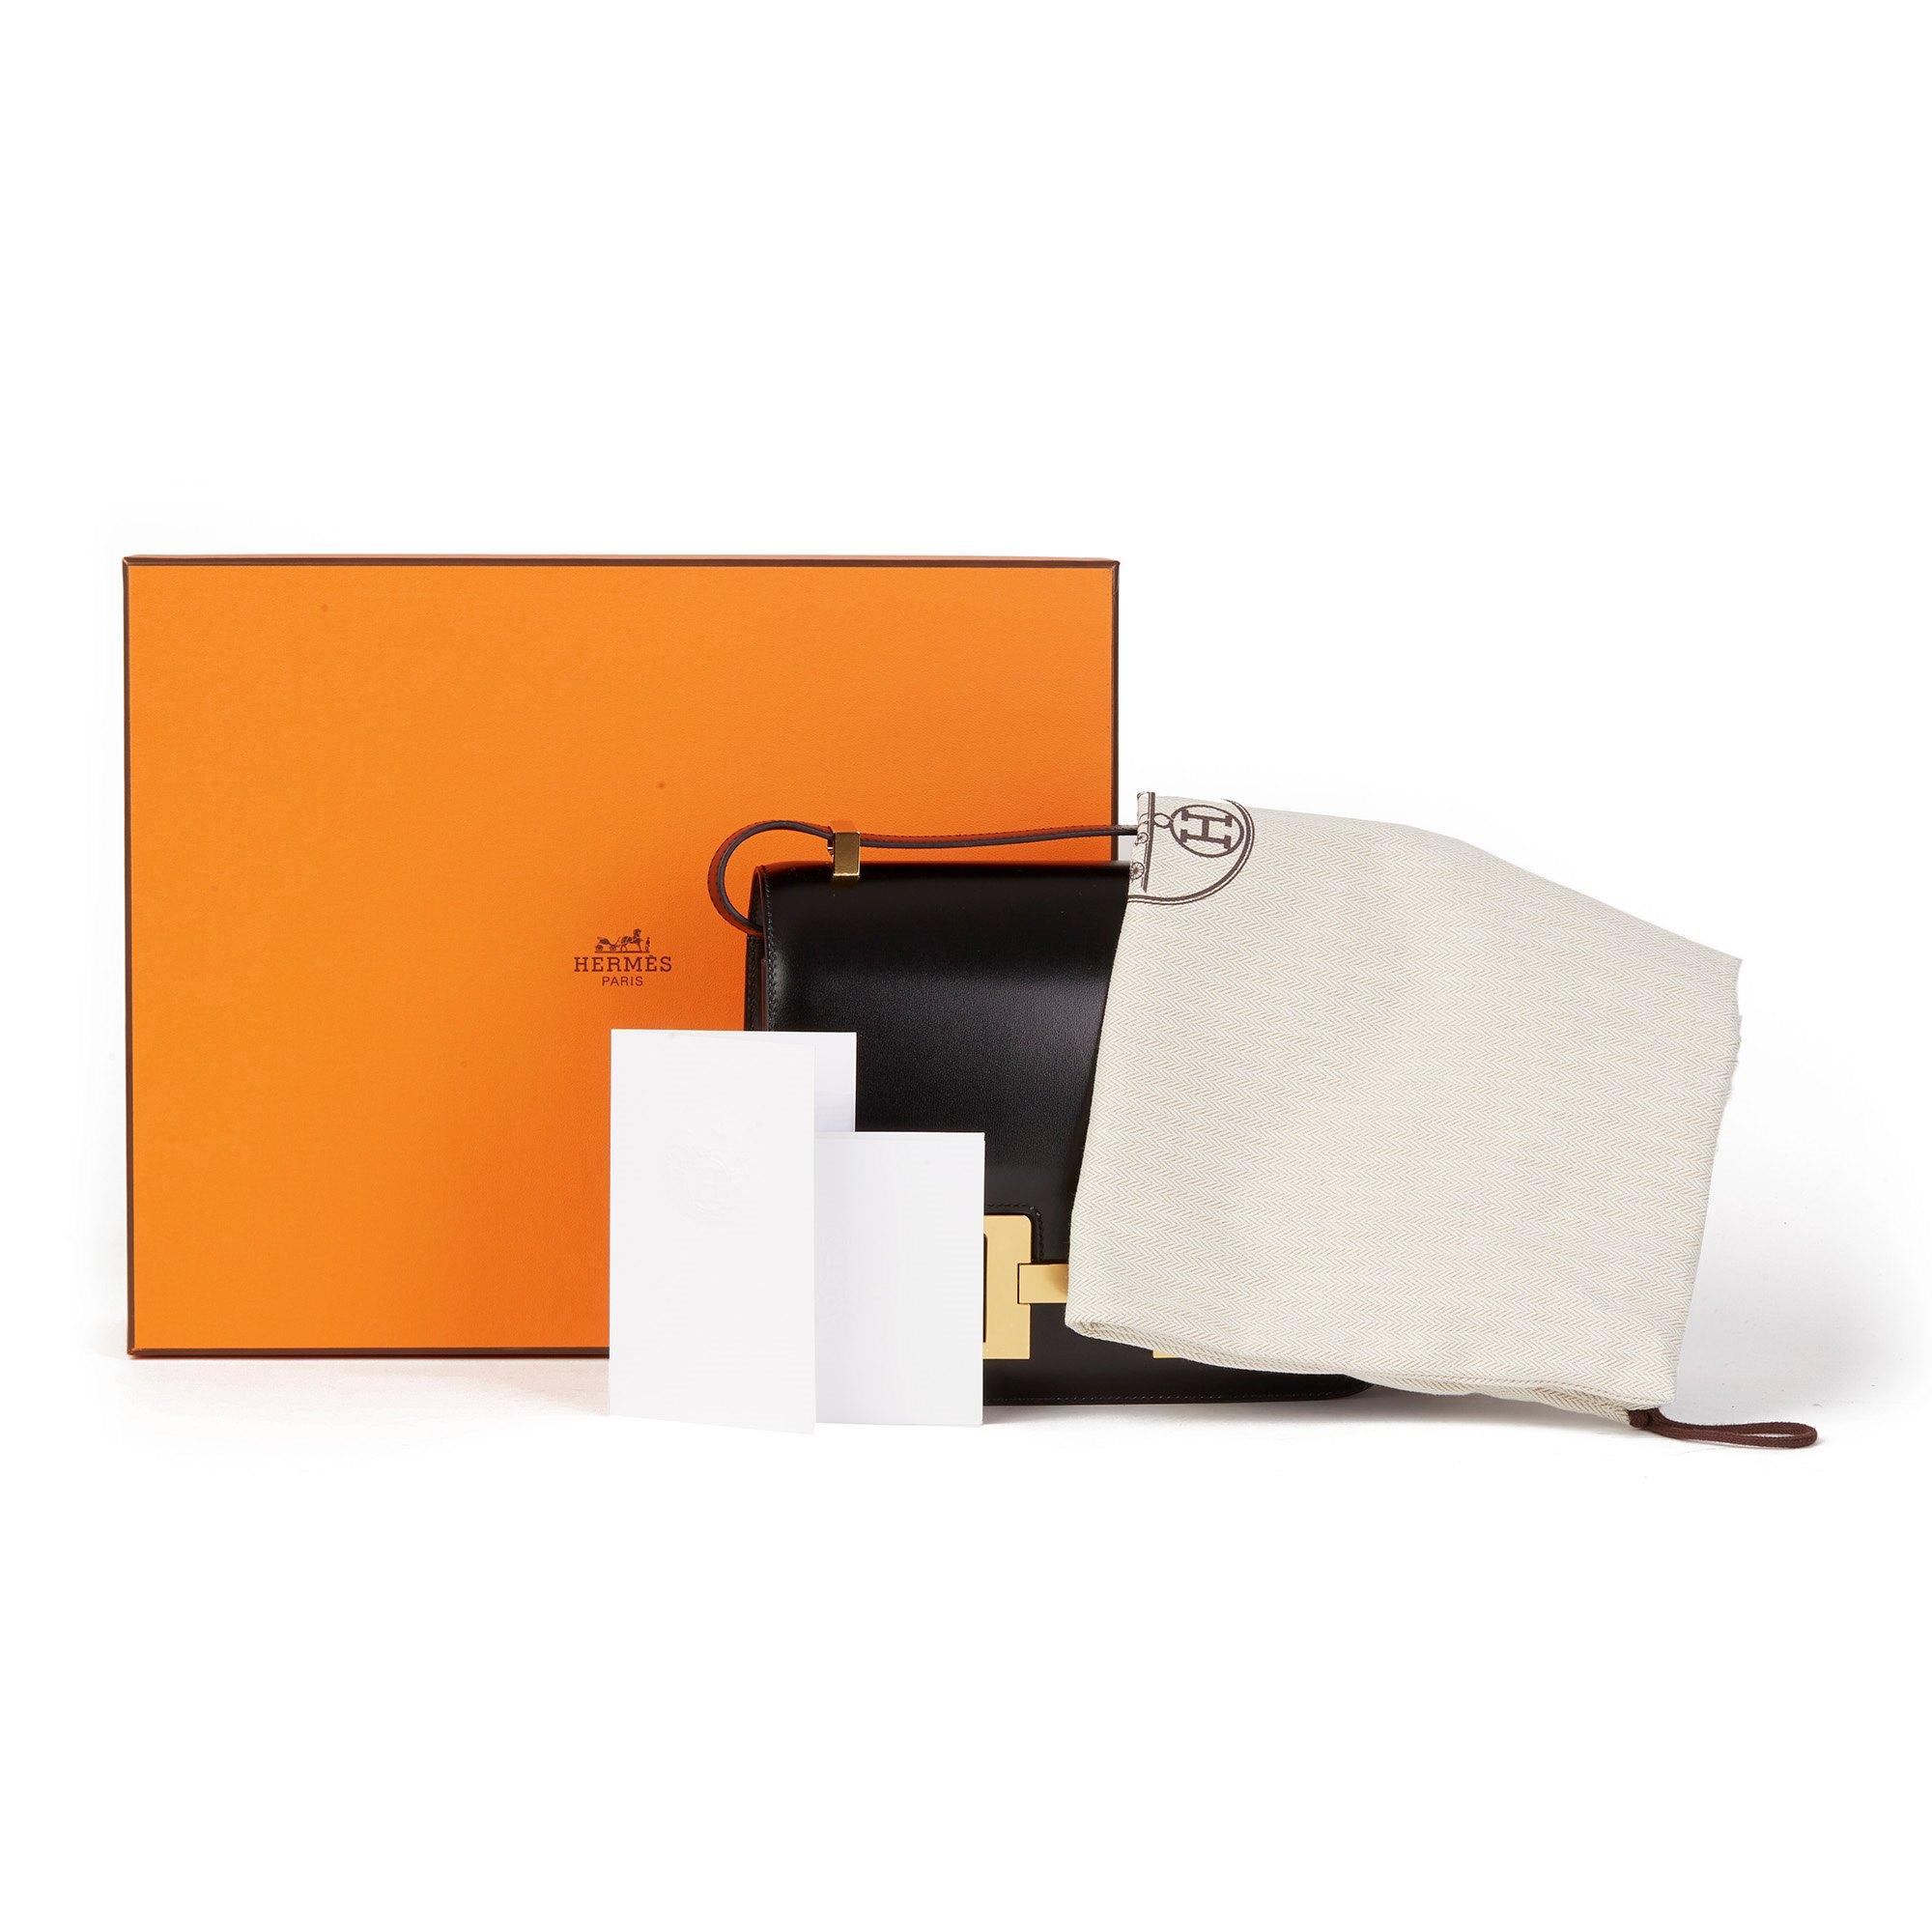 Hermès Black Box Calf Leather Constance 23